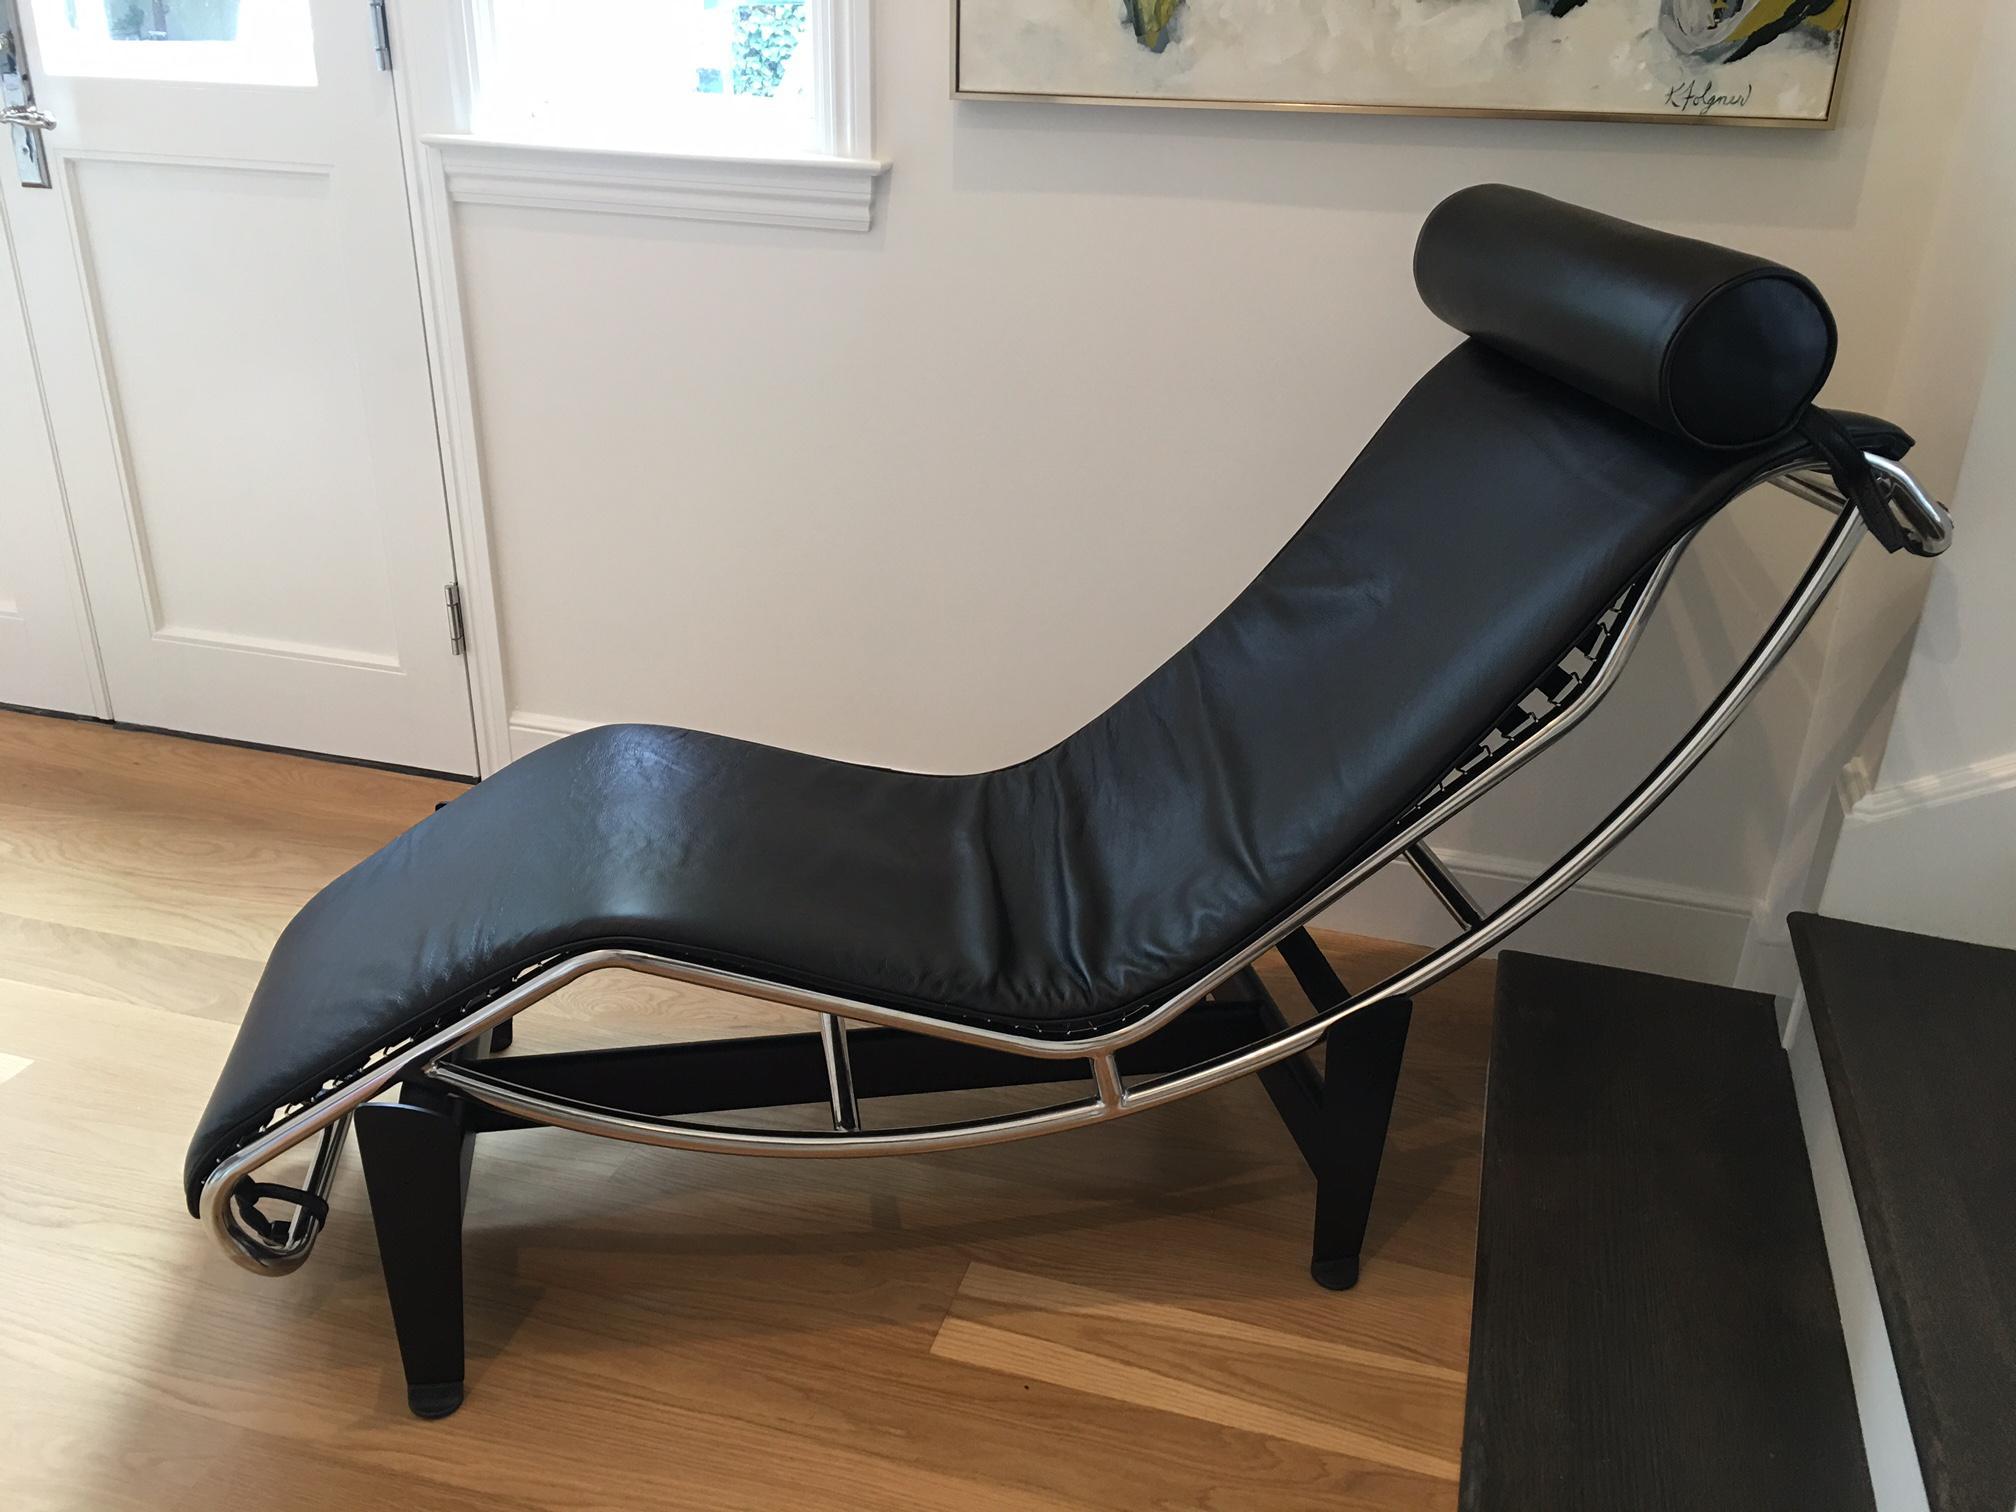 Chaiselongue Modern mid century modern le corbusier lc4 style chaise lounge chair chairish